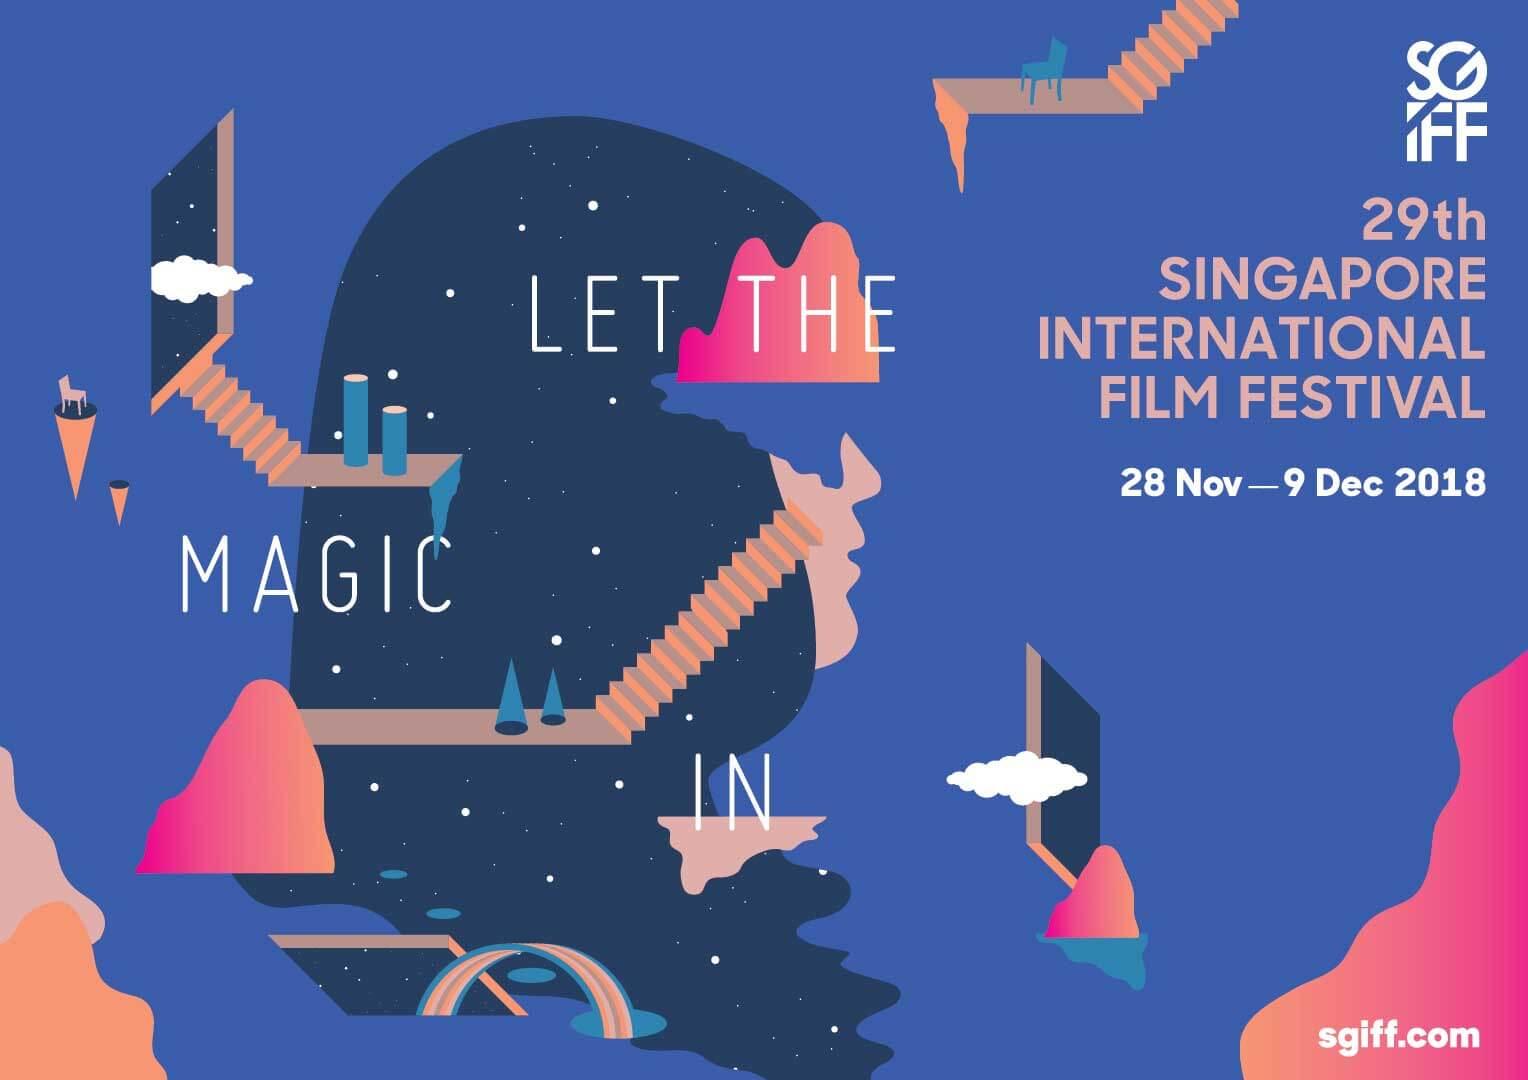 Singapore International Film Festival 2018 - Let The Magic In!